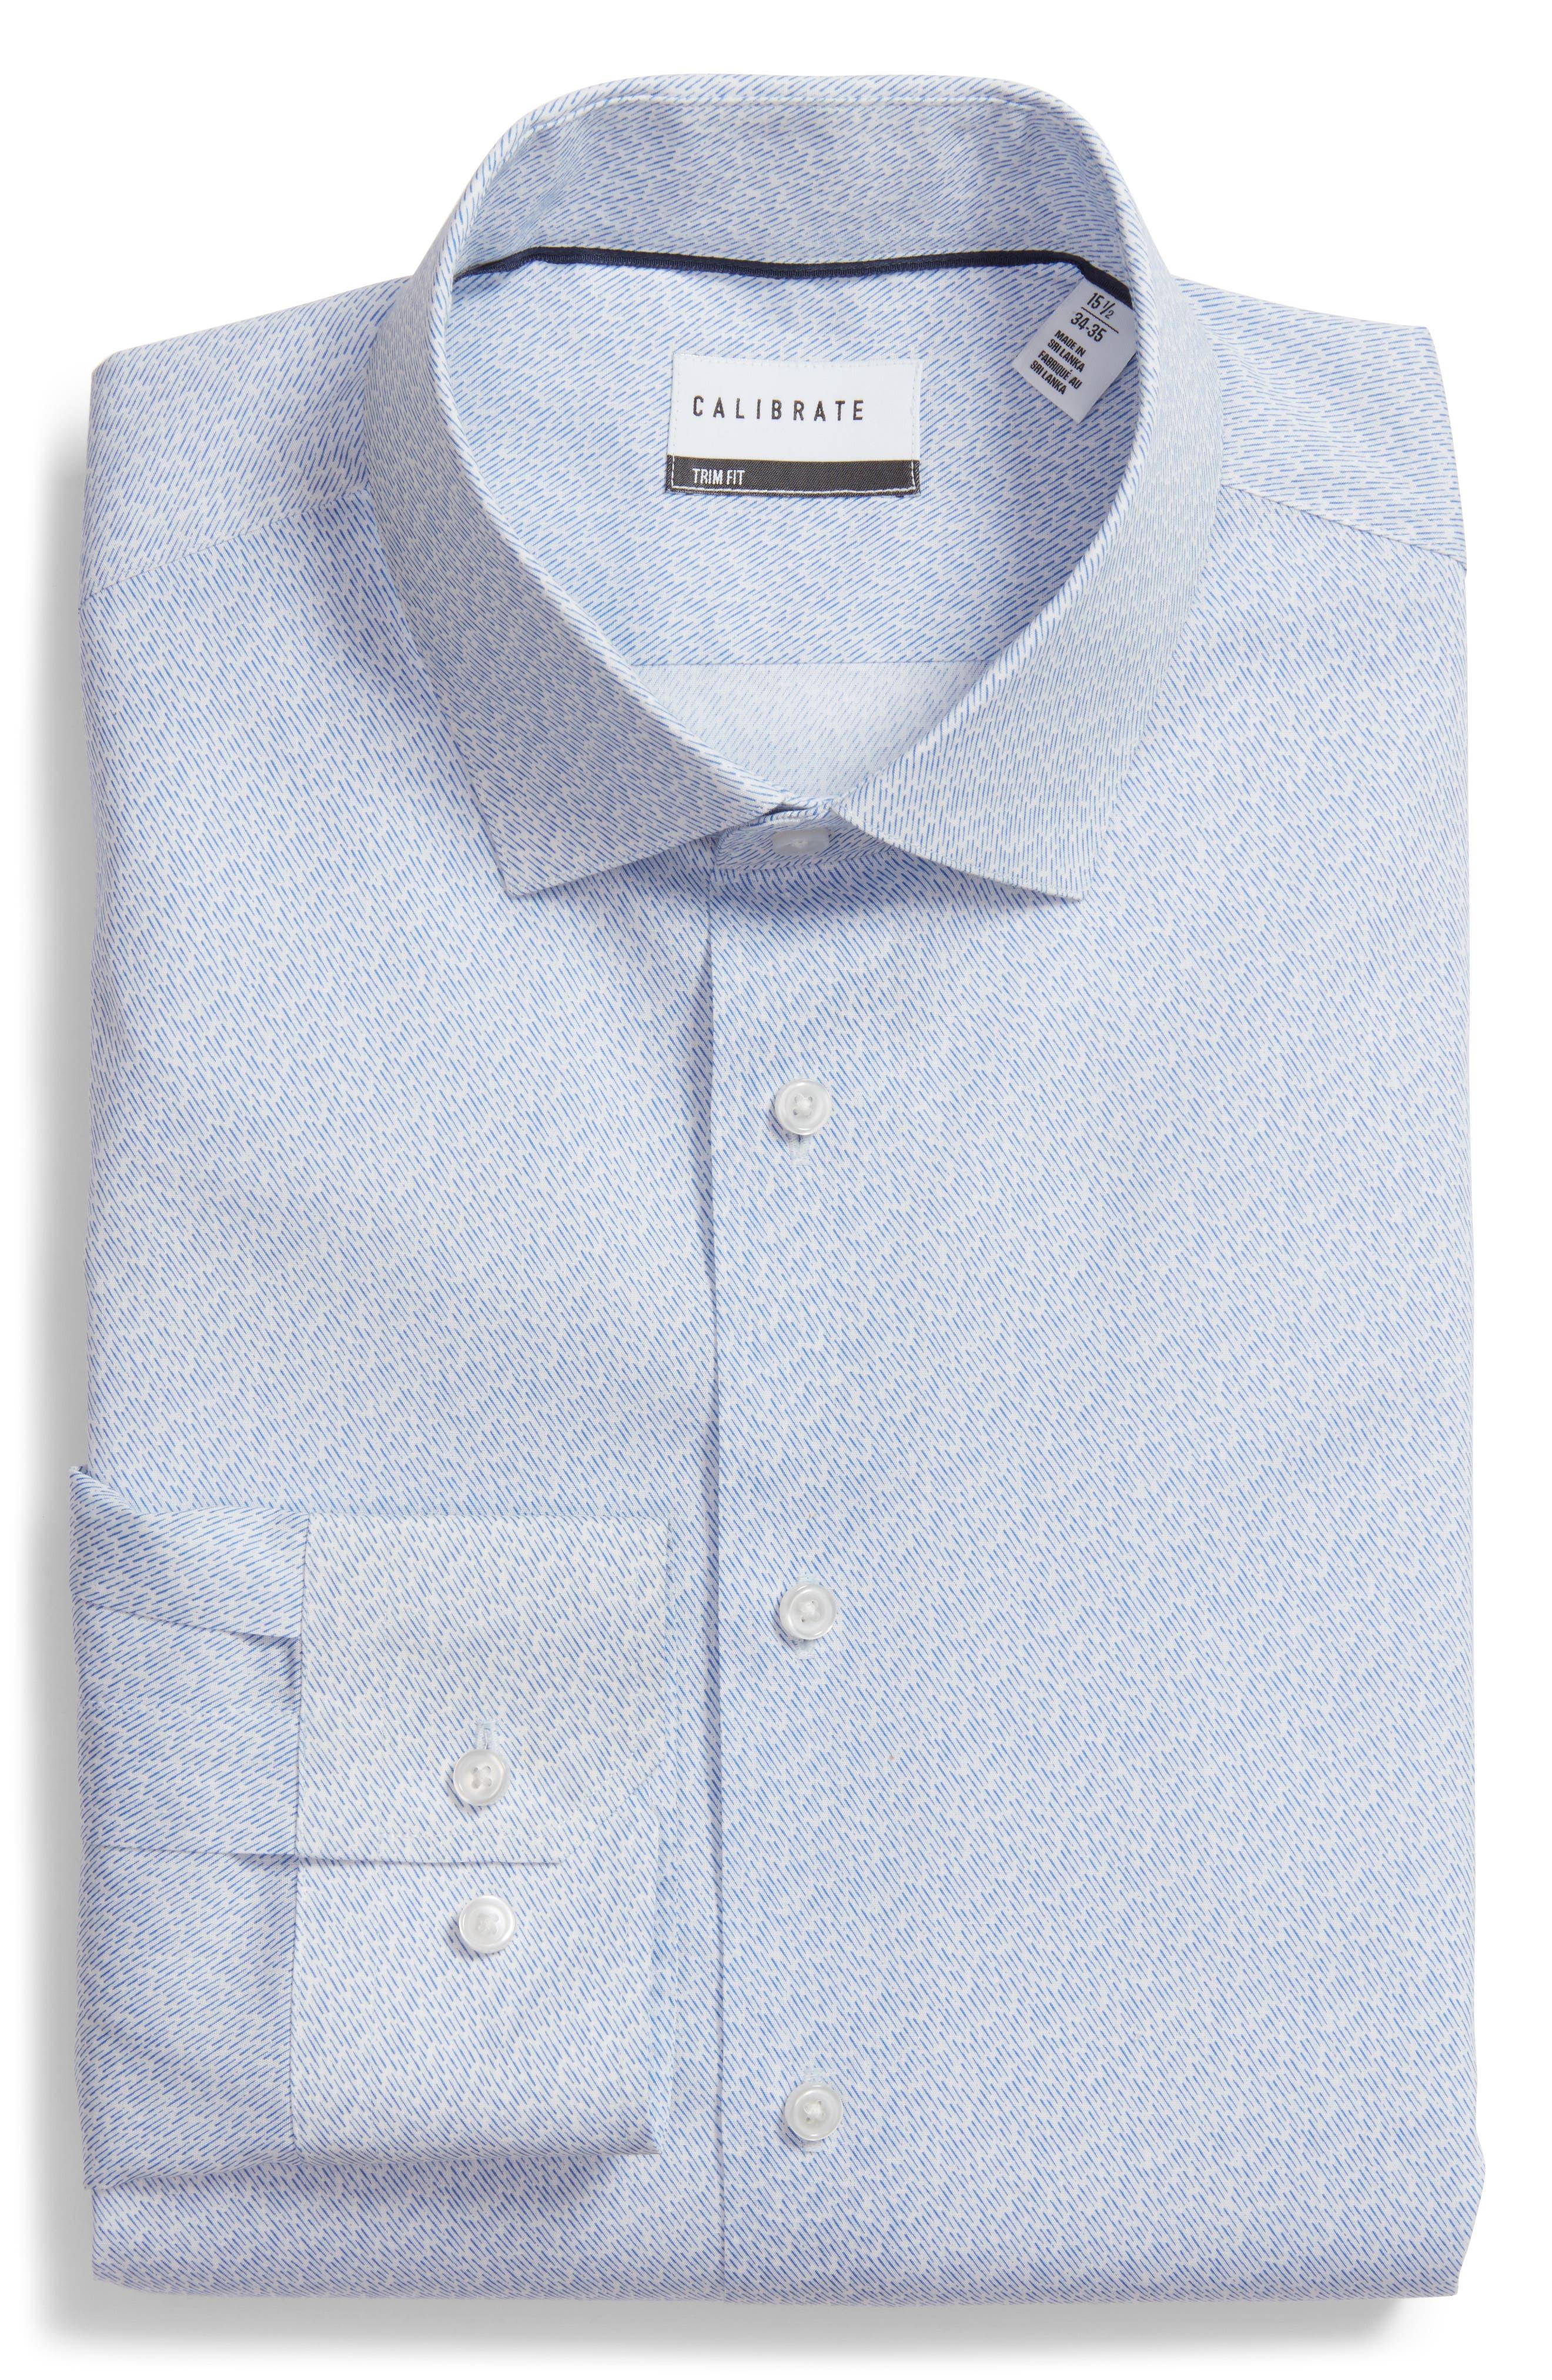 Trim Fit Print Dress Shirt,                         Main,                         color, 450